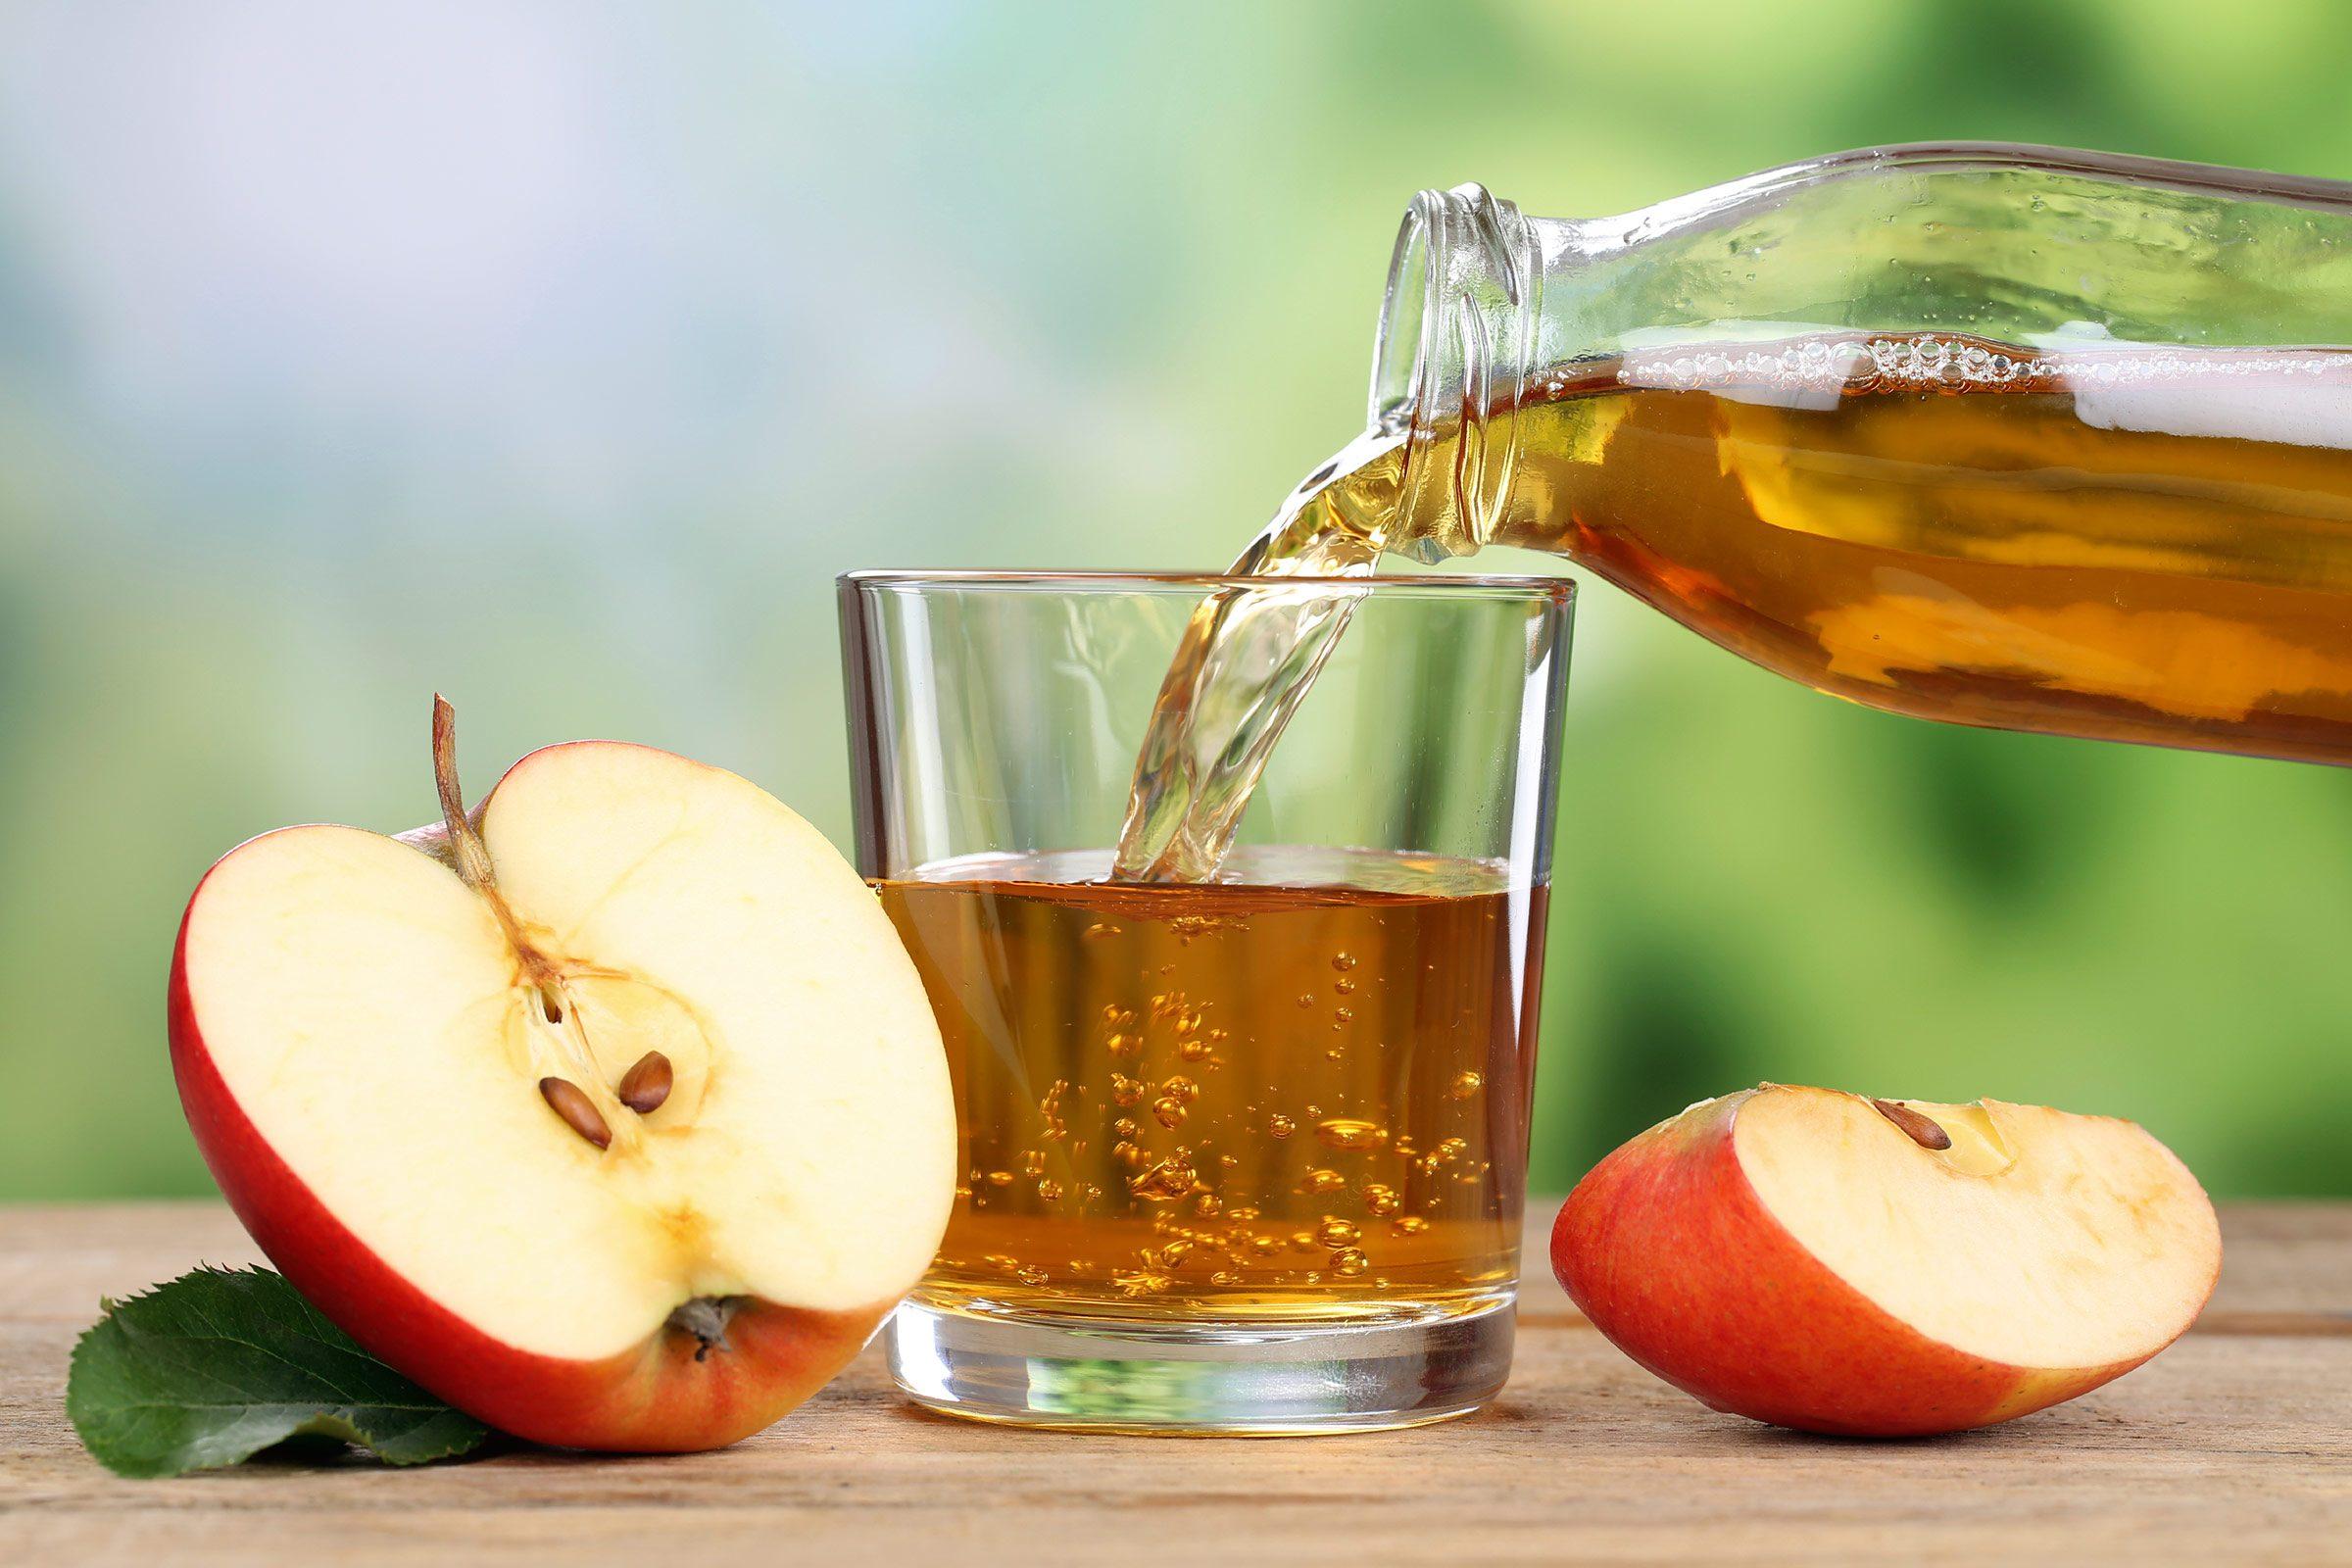 Sore throat remedy: Apple cider vinegar and salt